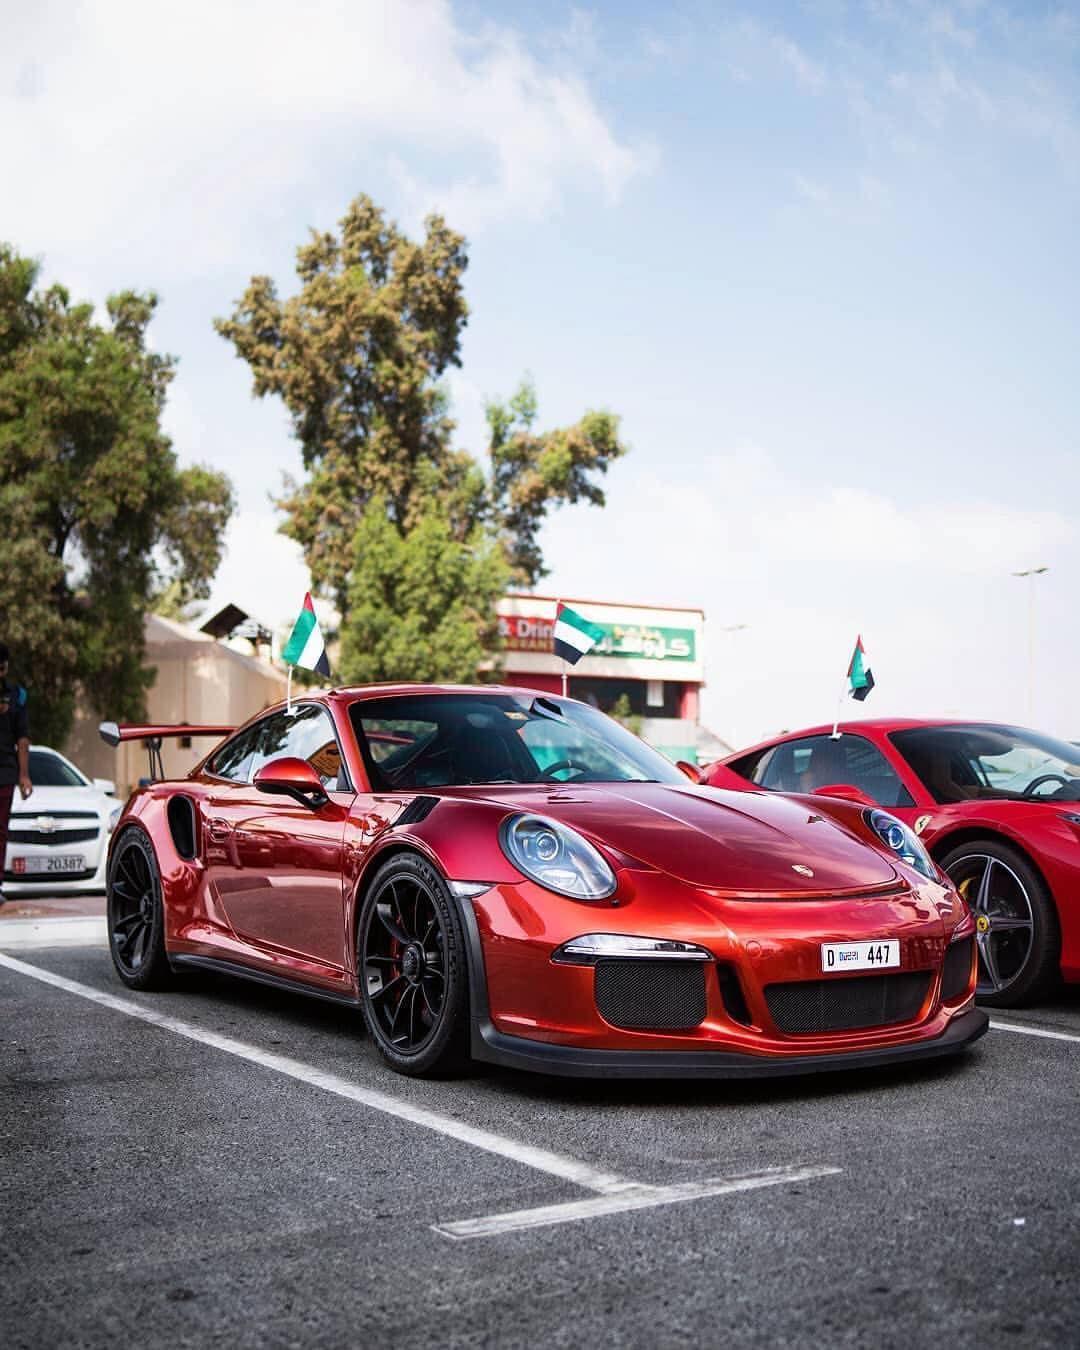 Luxury Cars Porsche Cars Black Porsche: Pin By Michele Noh On Dream Cars